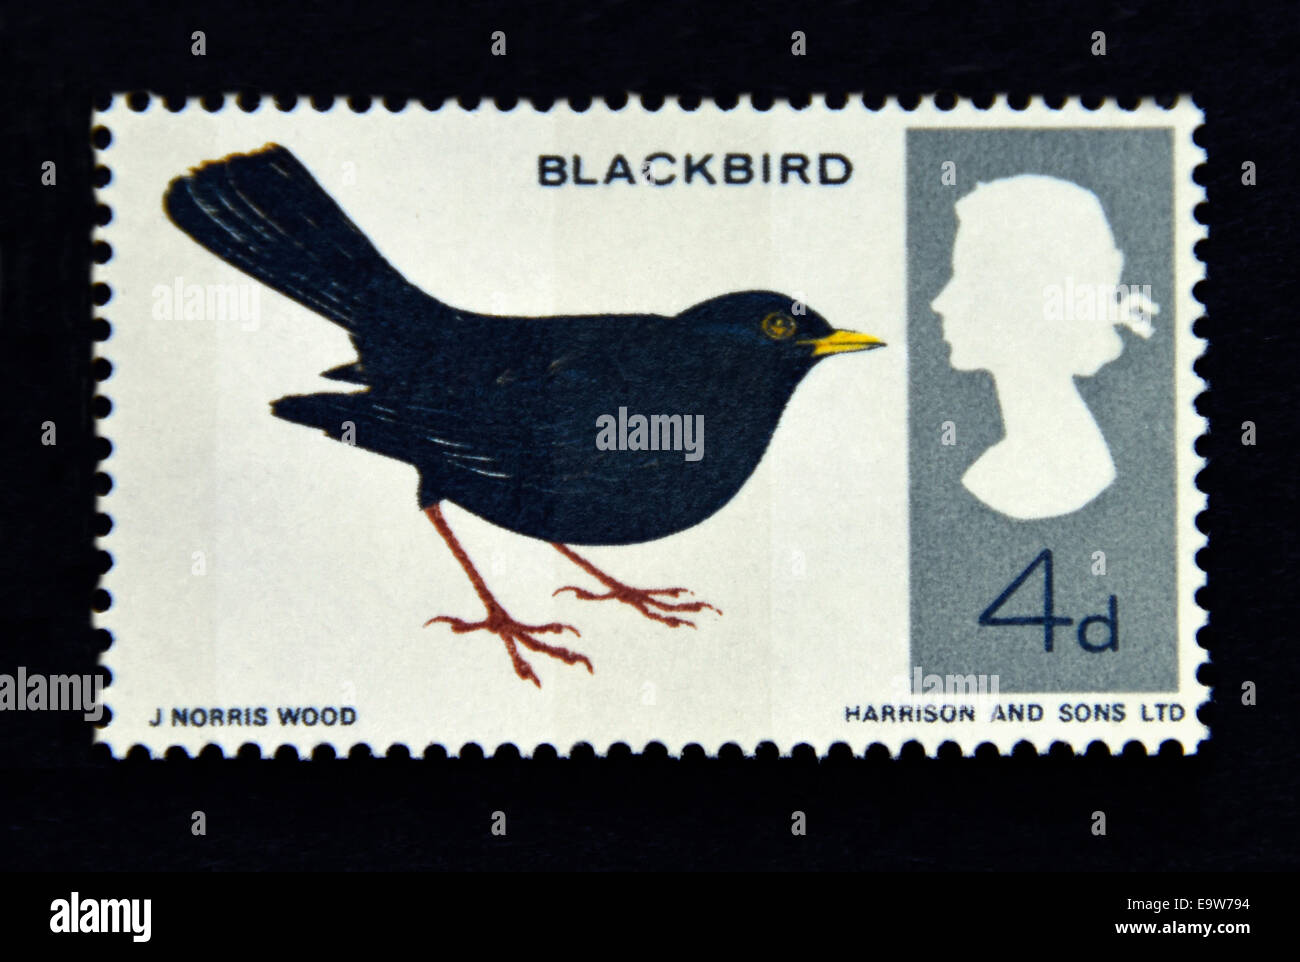 Postage stamp. Great Britain. Queen Elizabeth II. British Birds, Blackbird.1966. - Stock Image